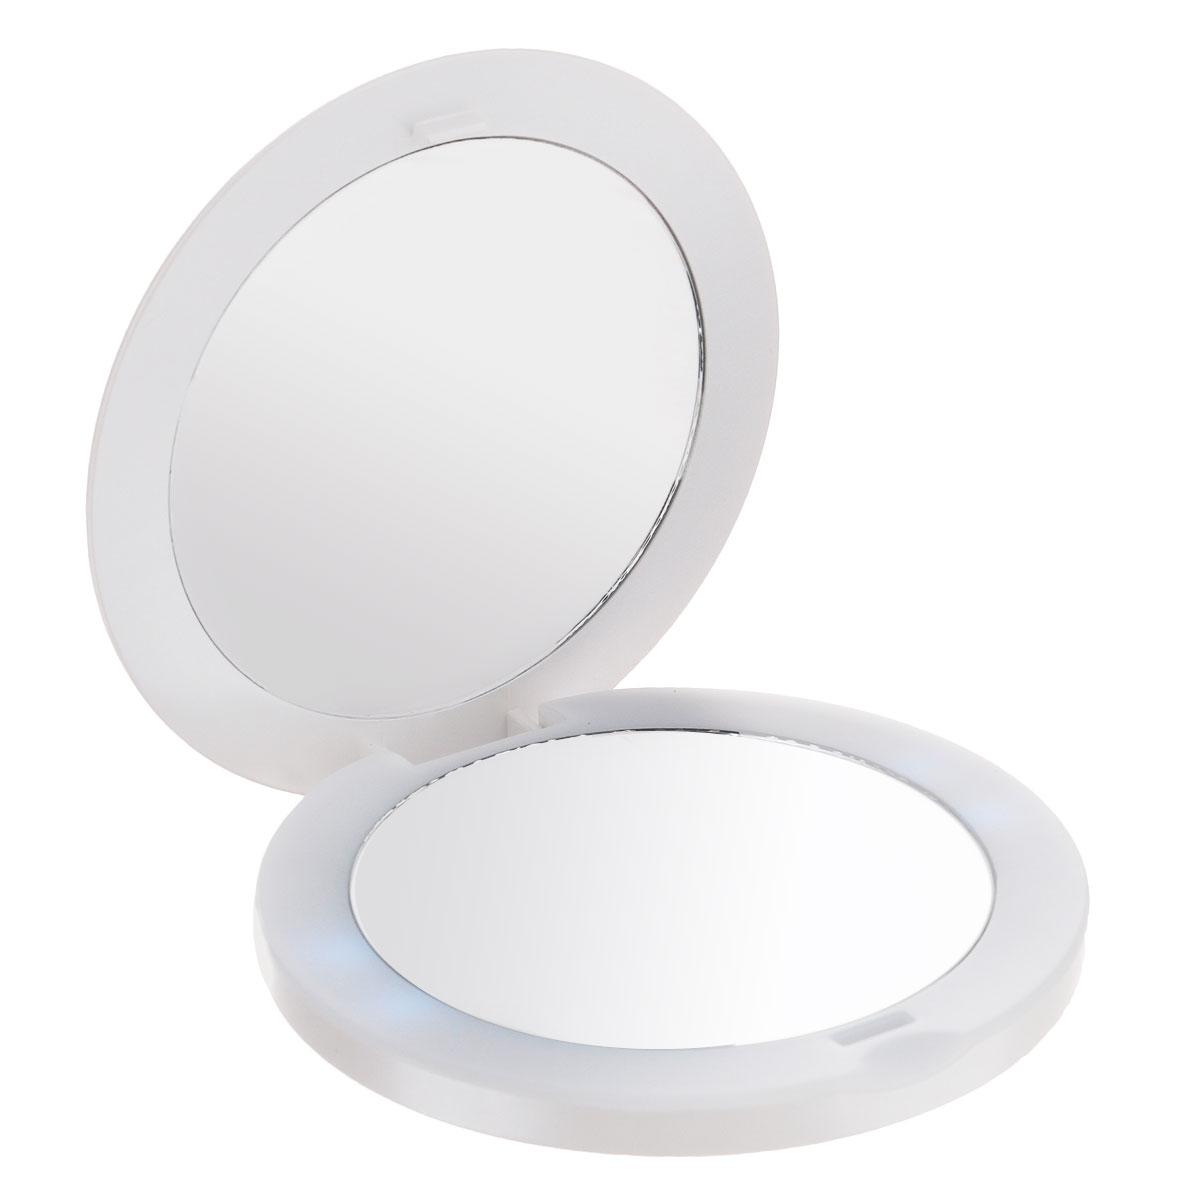 Touchbeauty Компактное двойное зеркало, с подсветкой. AS-1275